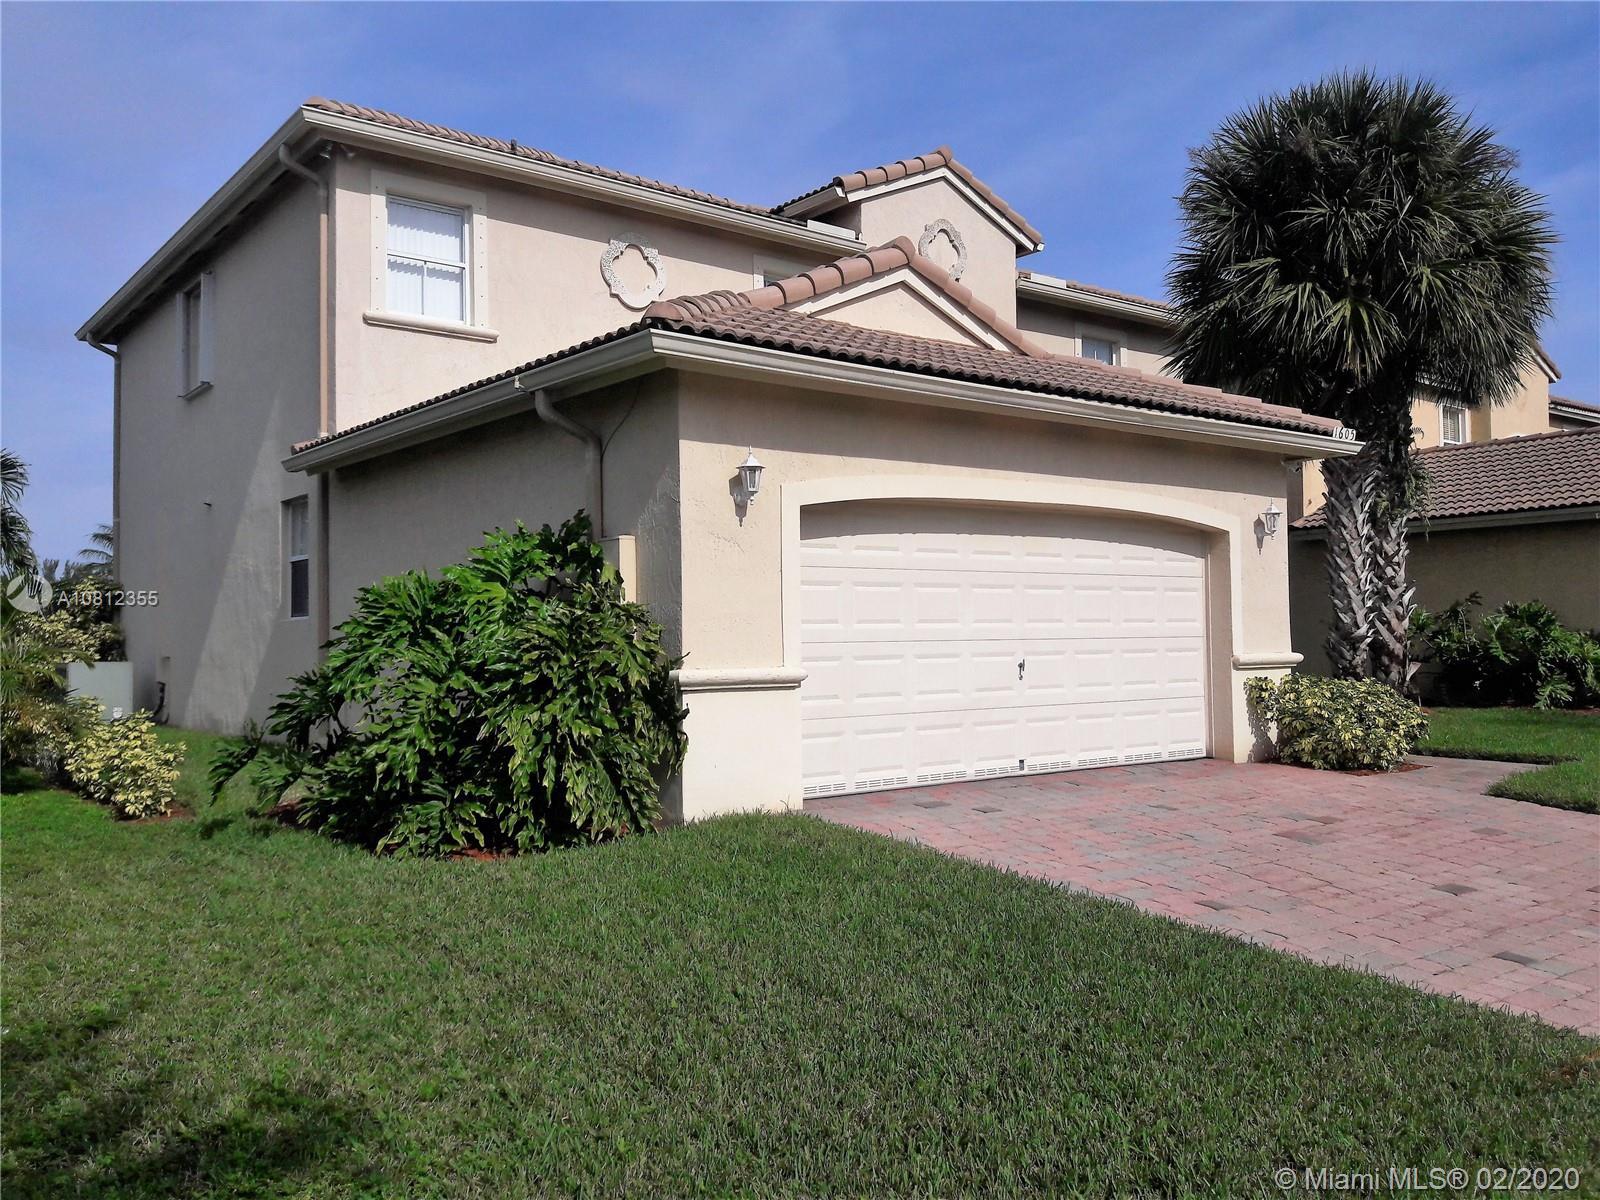 1605 SE 16th St Property Photo - Homestead, FL real estate listing